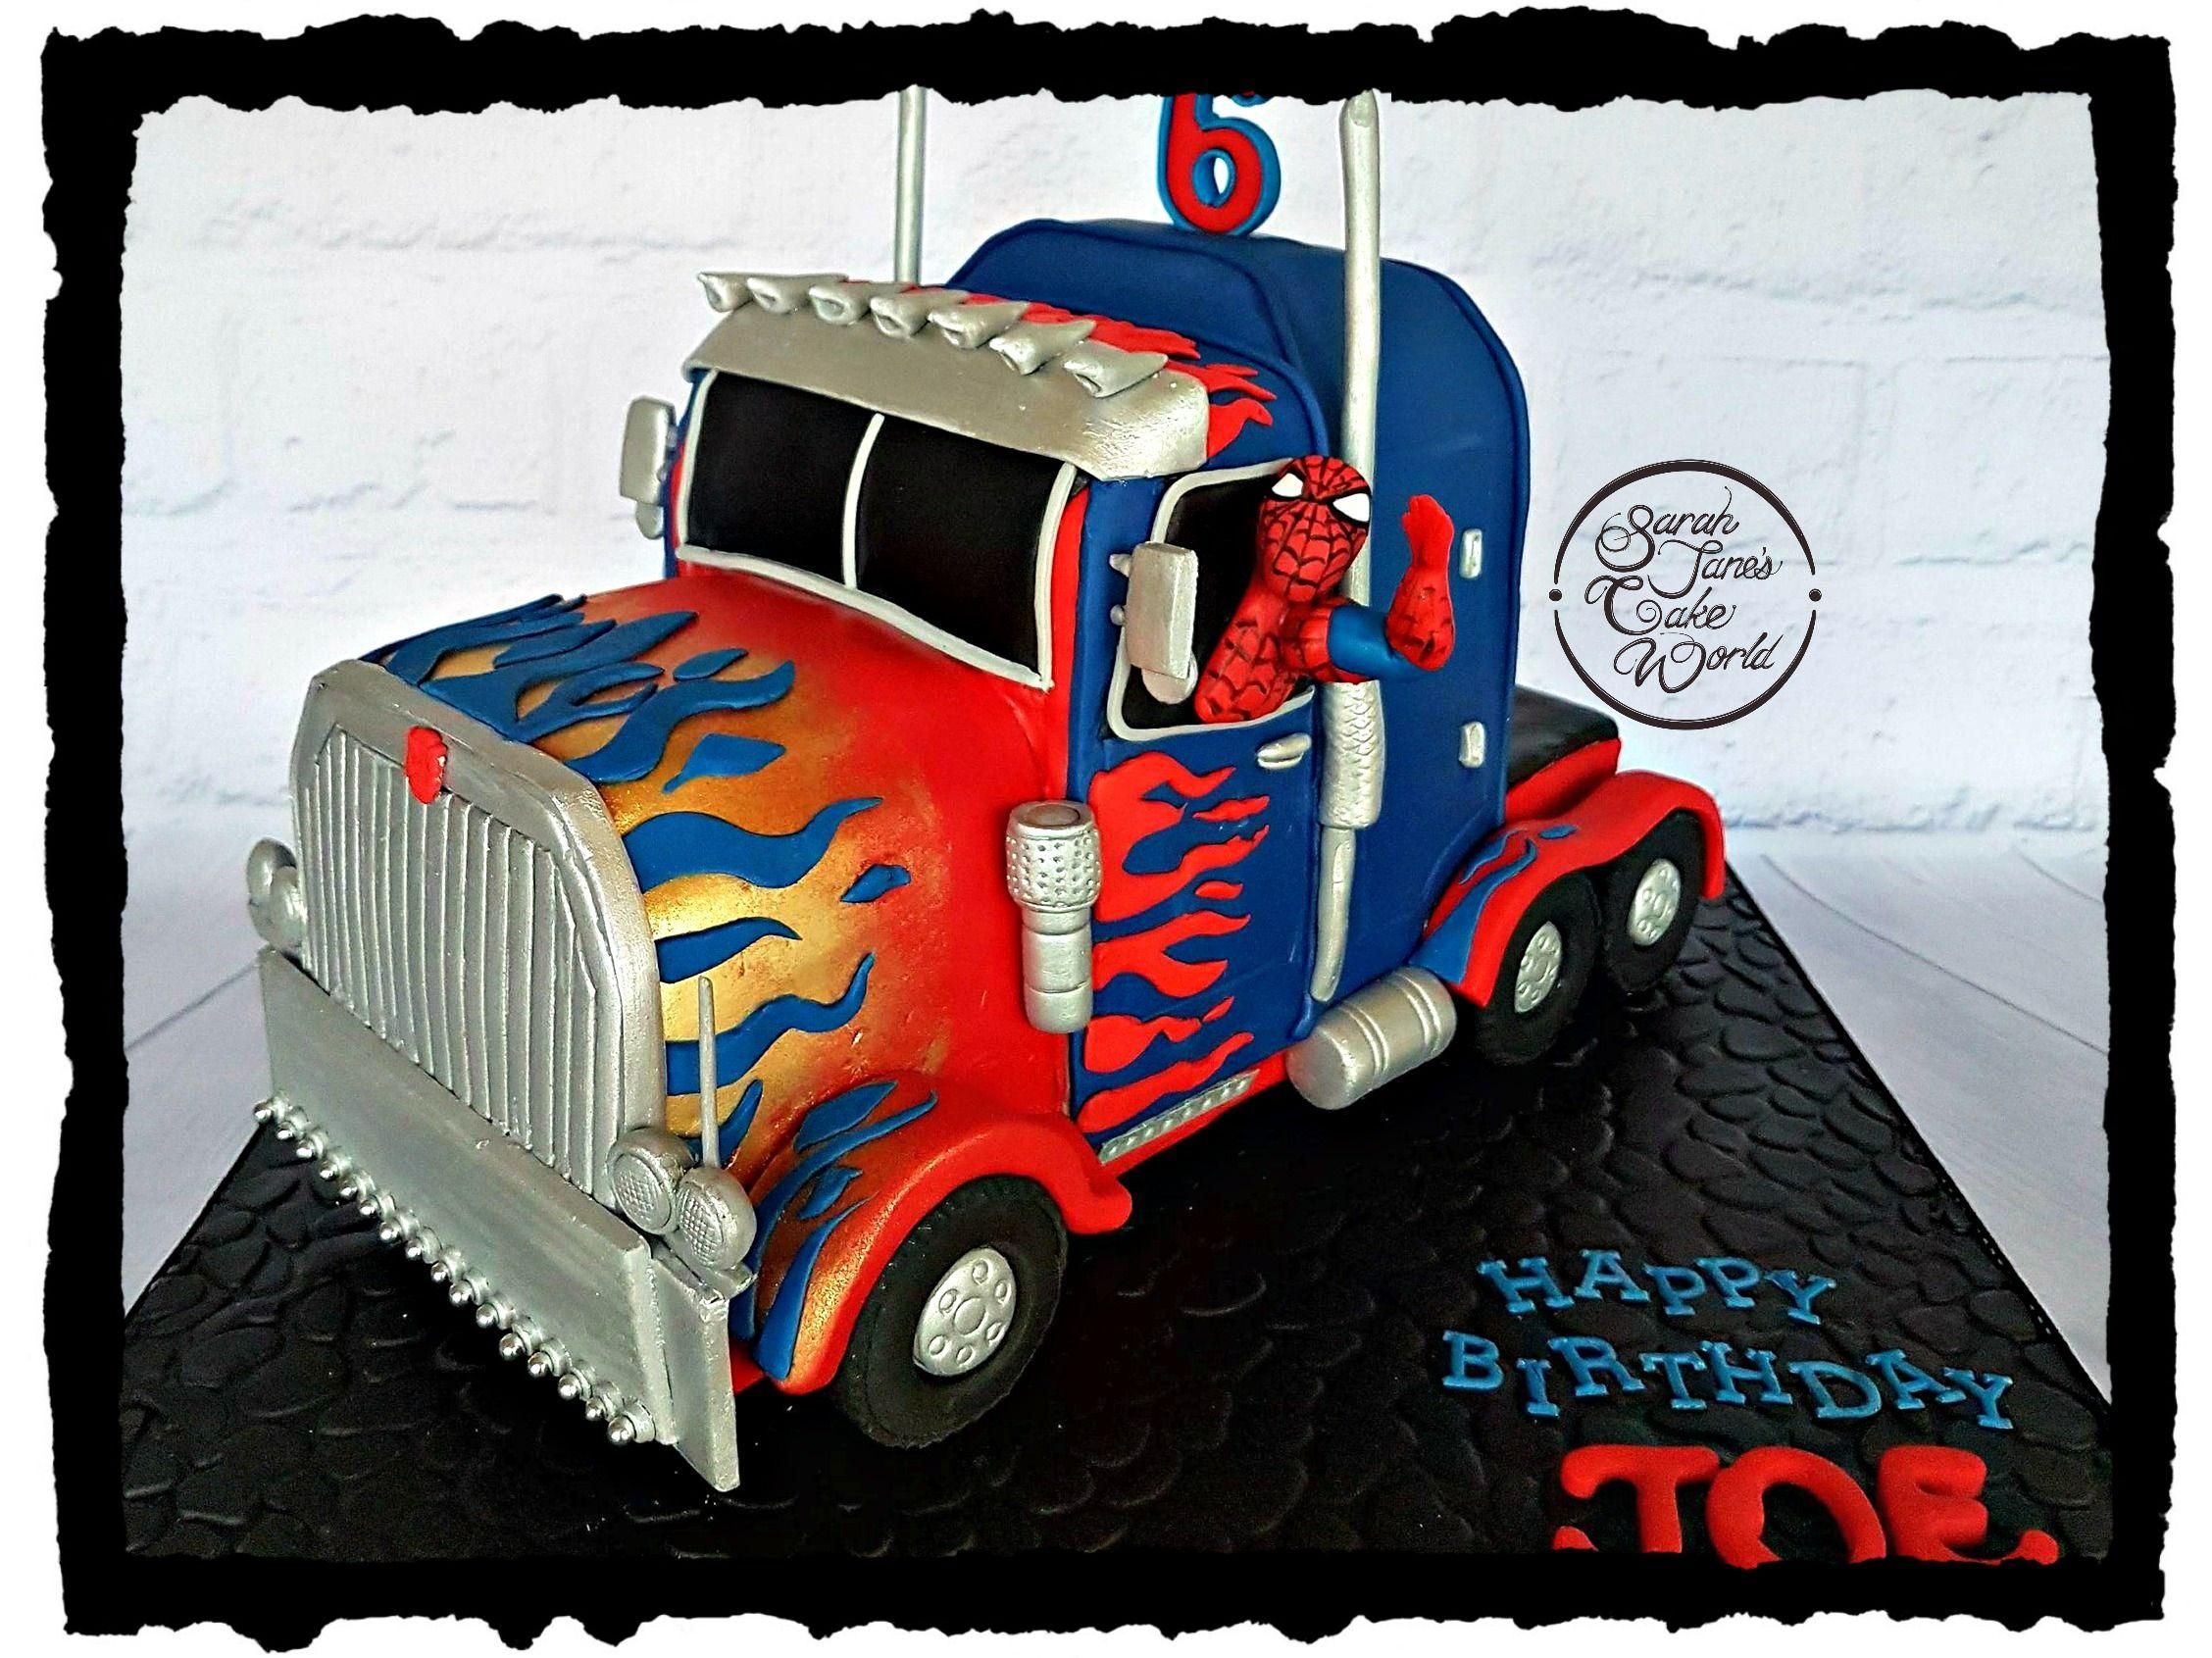 Optimus Prime Truck Cake With Spiderman And Captain America Optimus Prime Truck Cake Truck Cakes Optimus Prime Truck